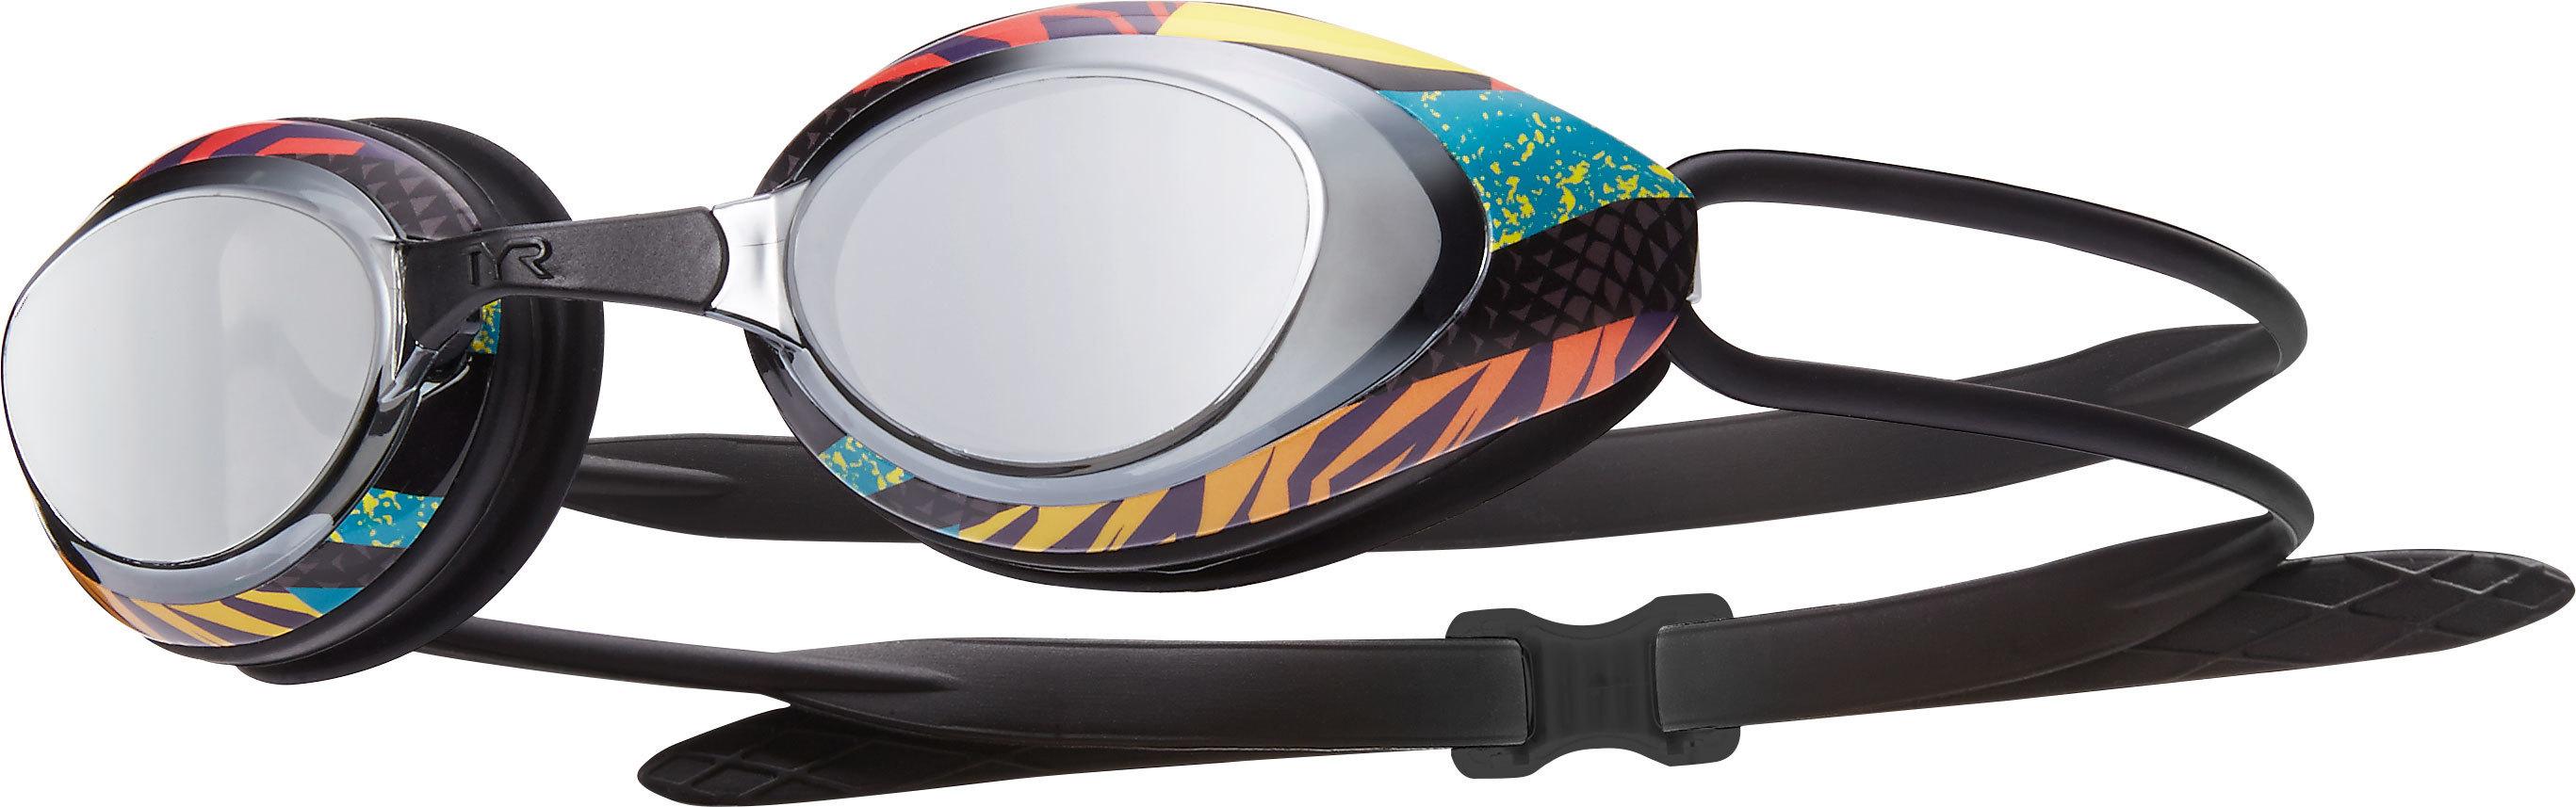 Очки для плавания TYR Black Hawk Racing Mirrored Prelude